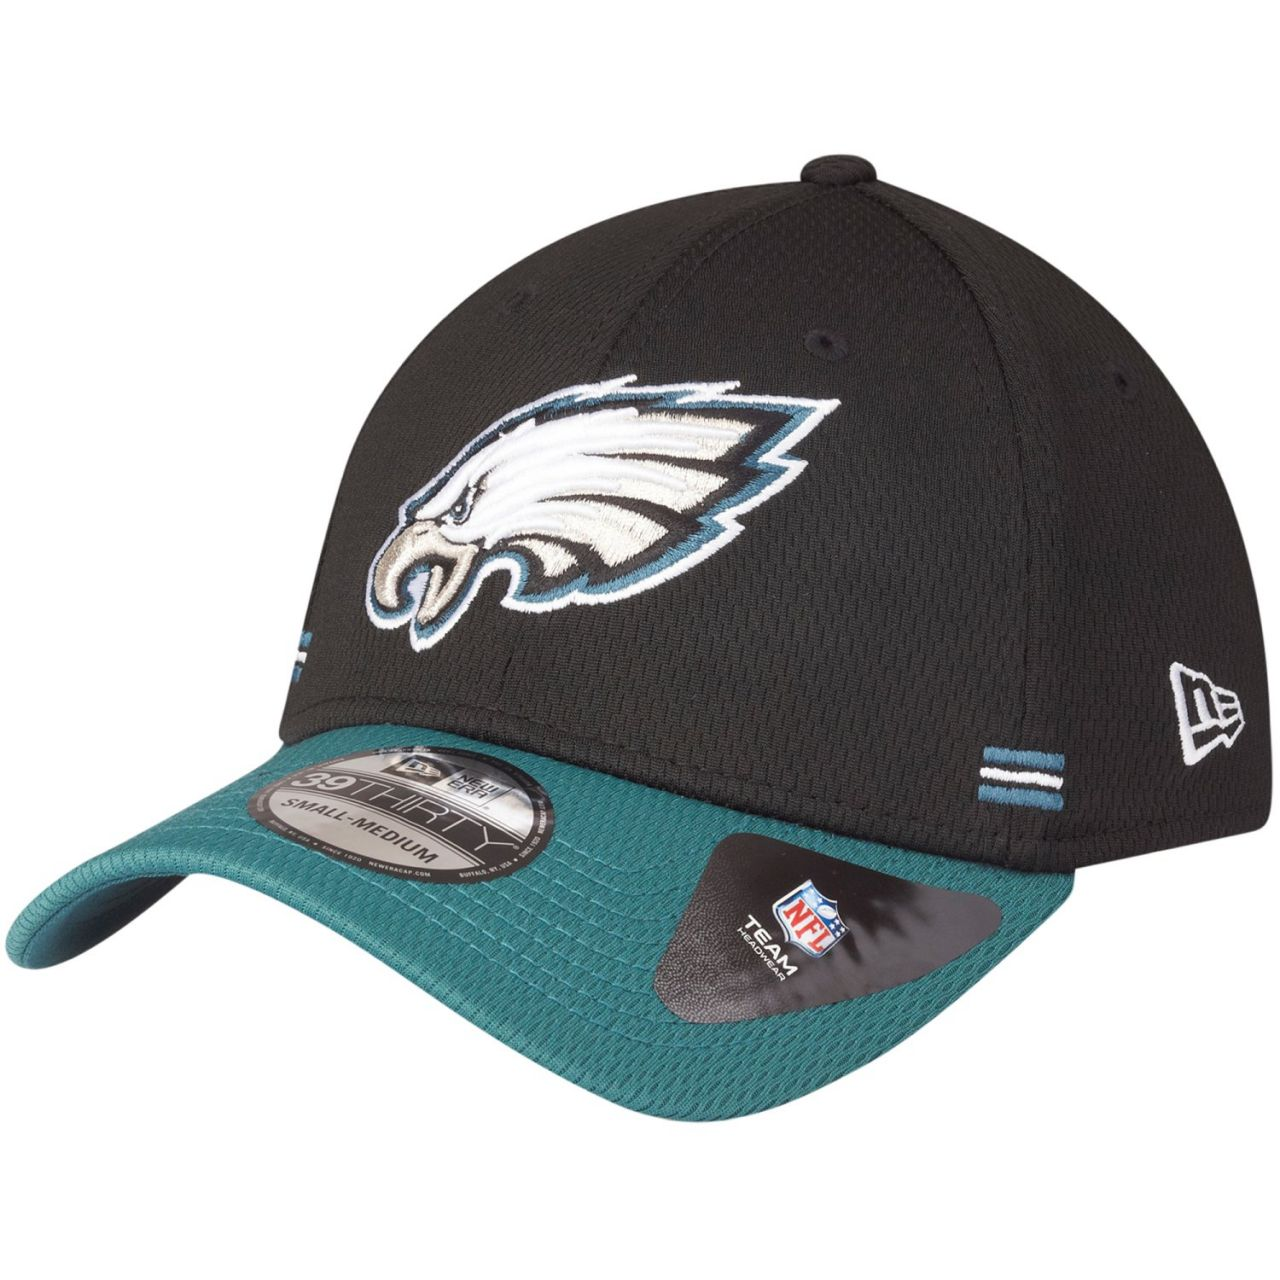 amfoo - New Era 39Thirty Cap - HOMETOWN Philadelphia Eagles